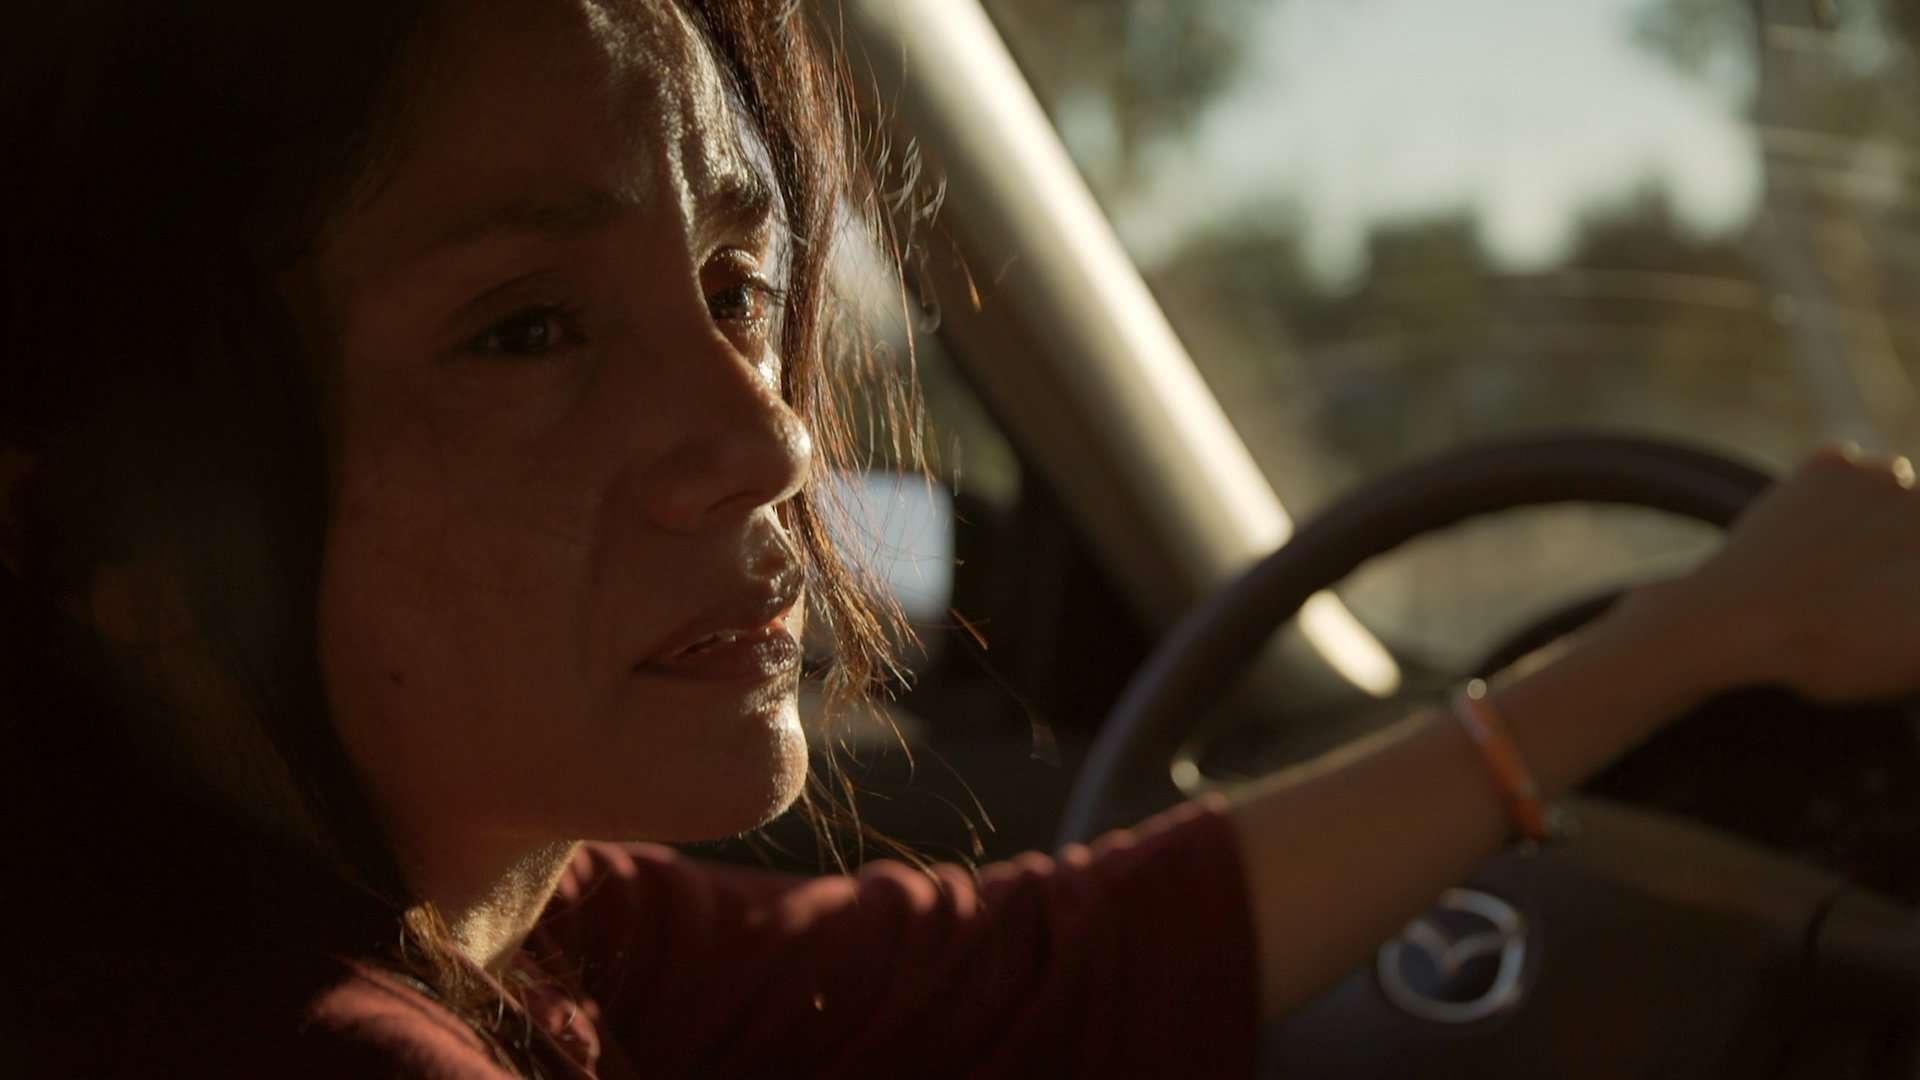 QWOCFF 2016 Featured Screening - El Camino by Alexander L. Lee